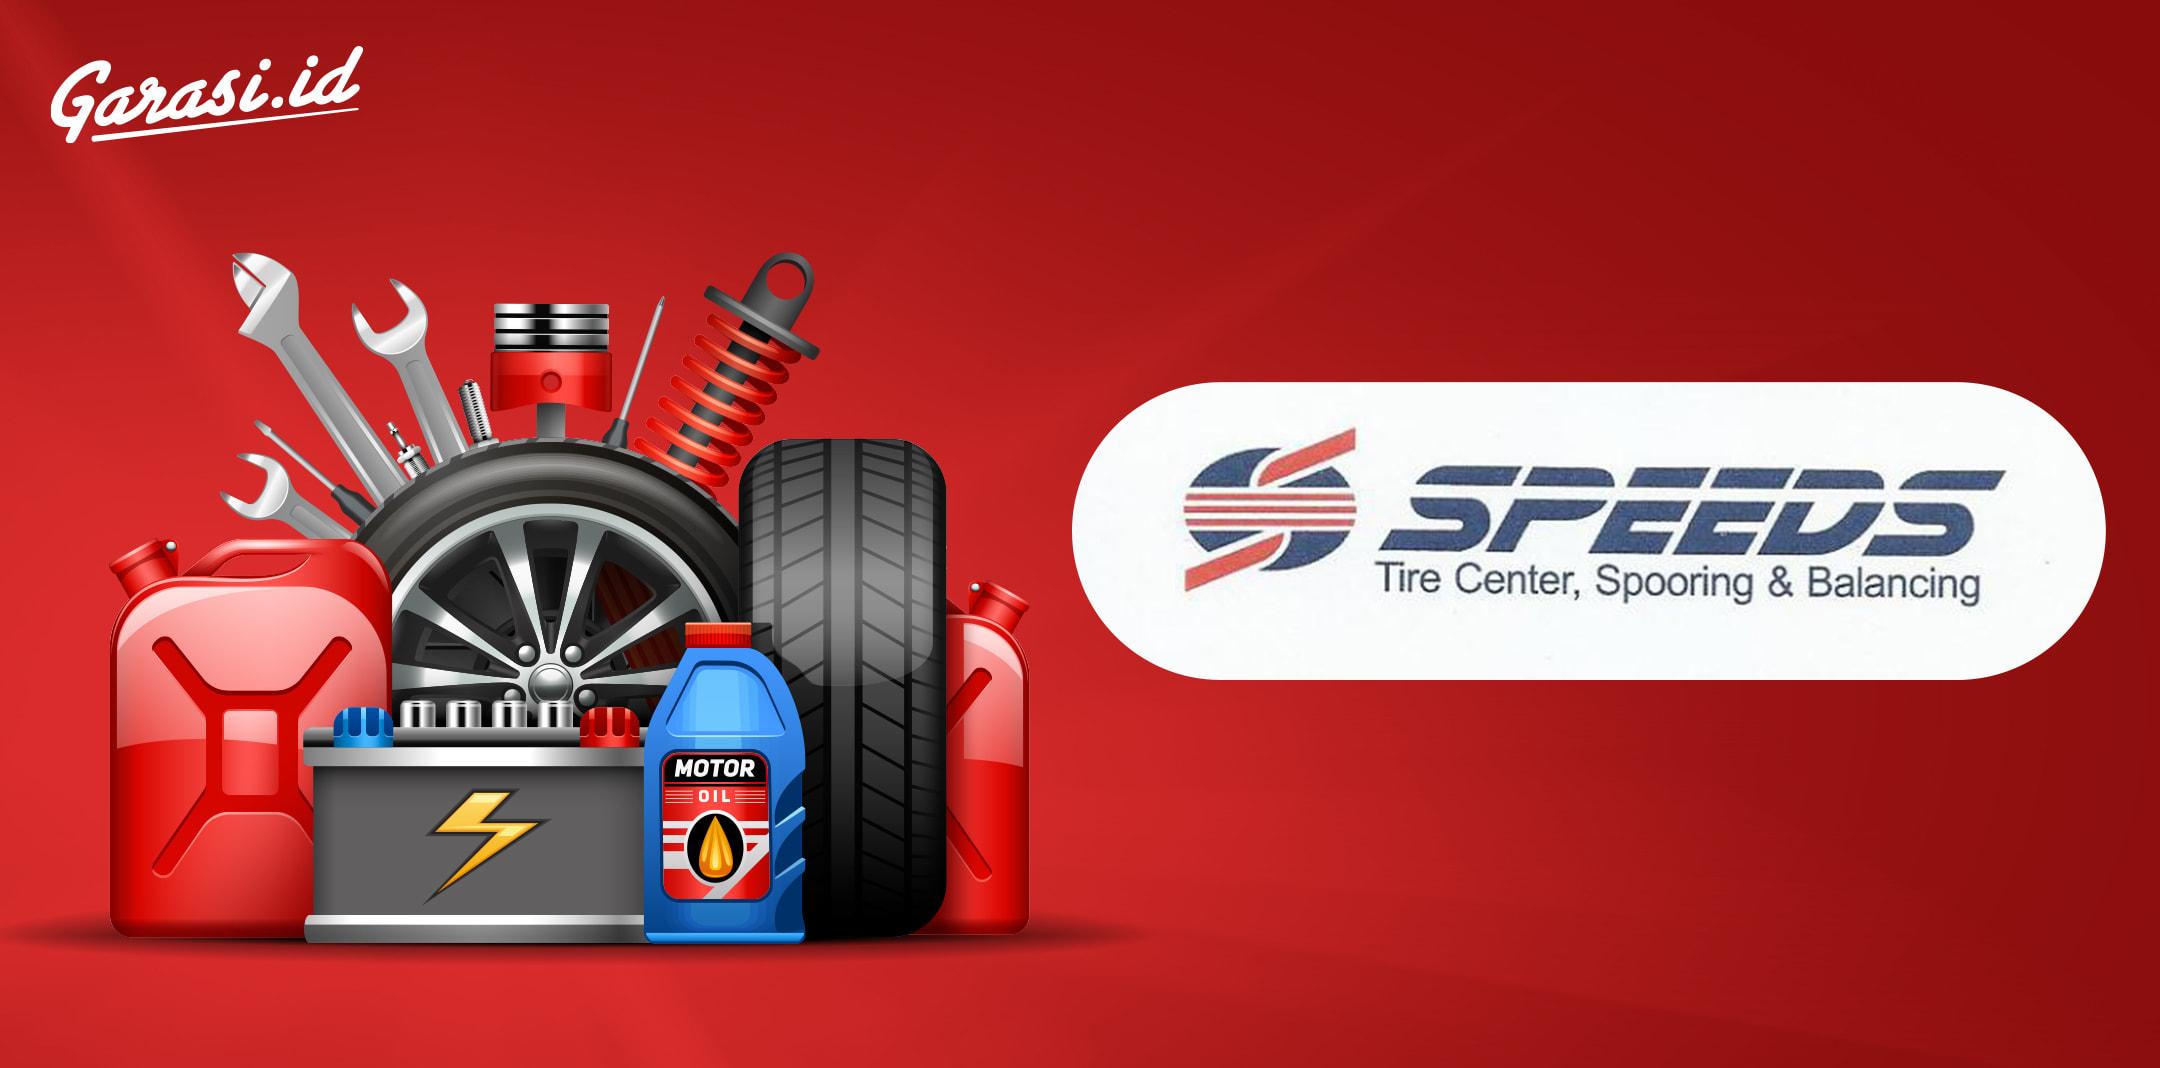 Speeds Tire Centre